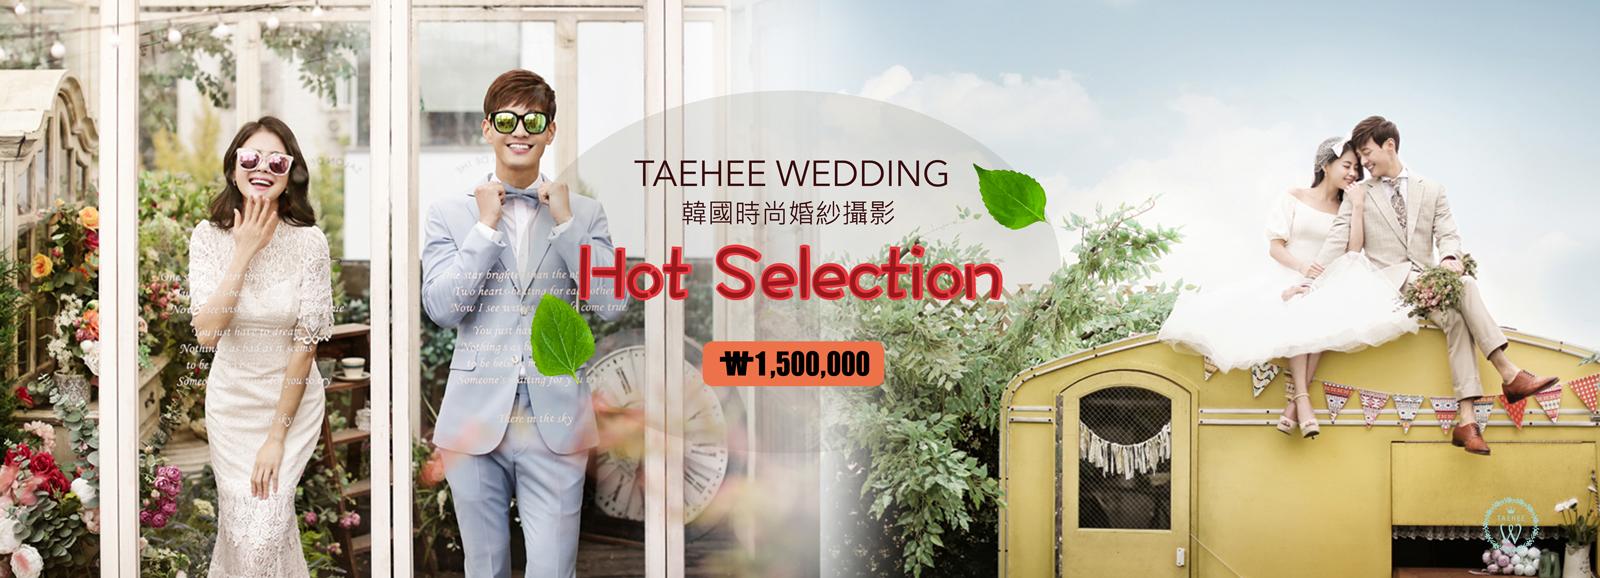 Korea Prewedding price promotion